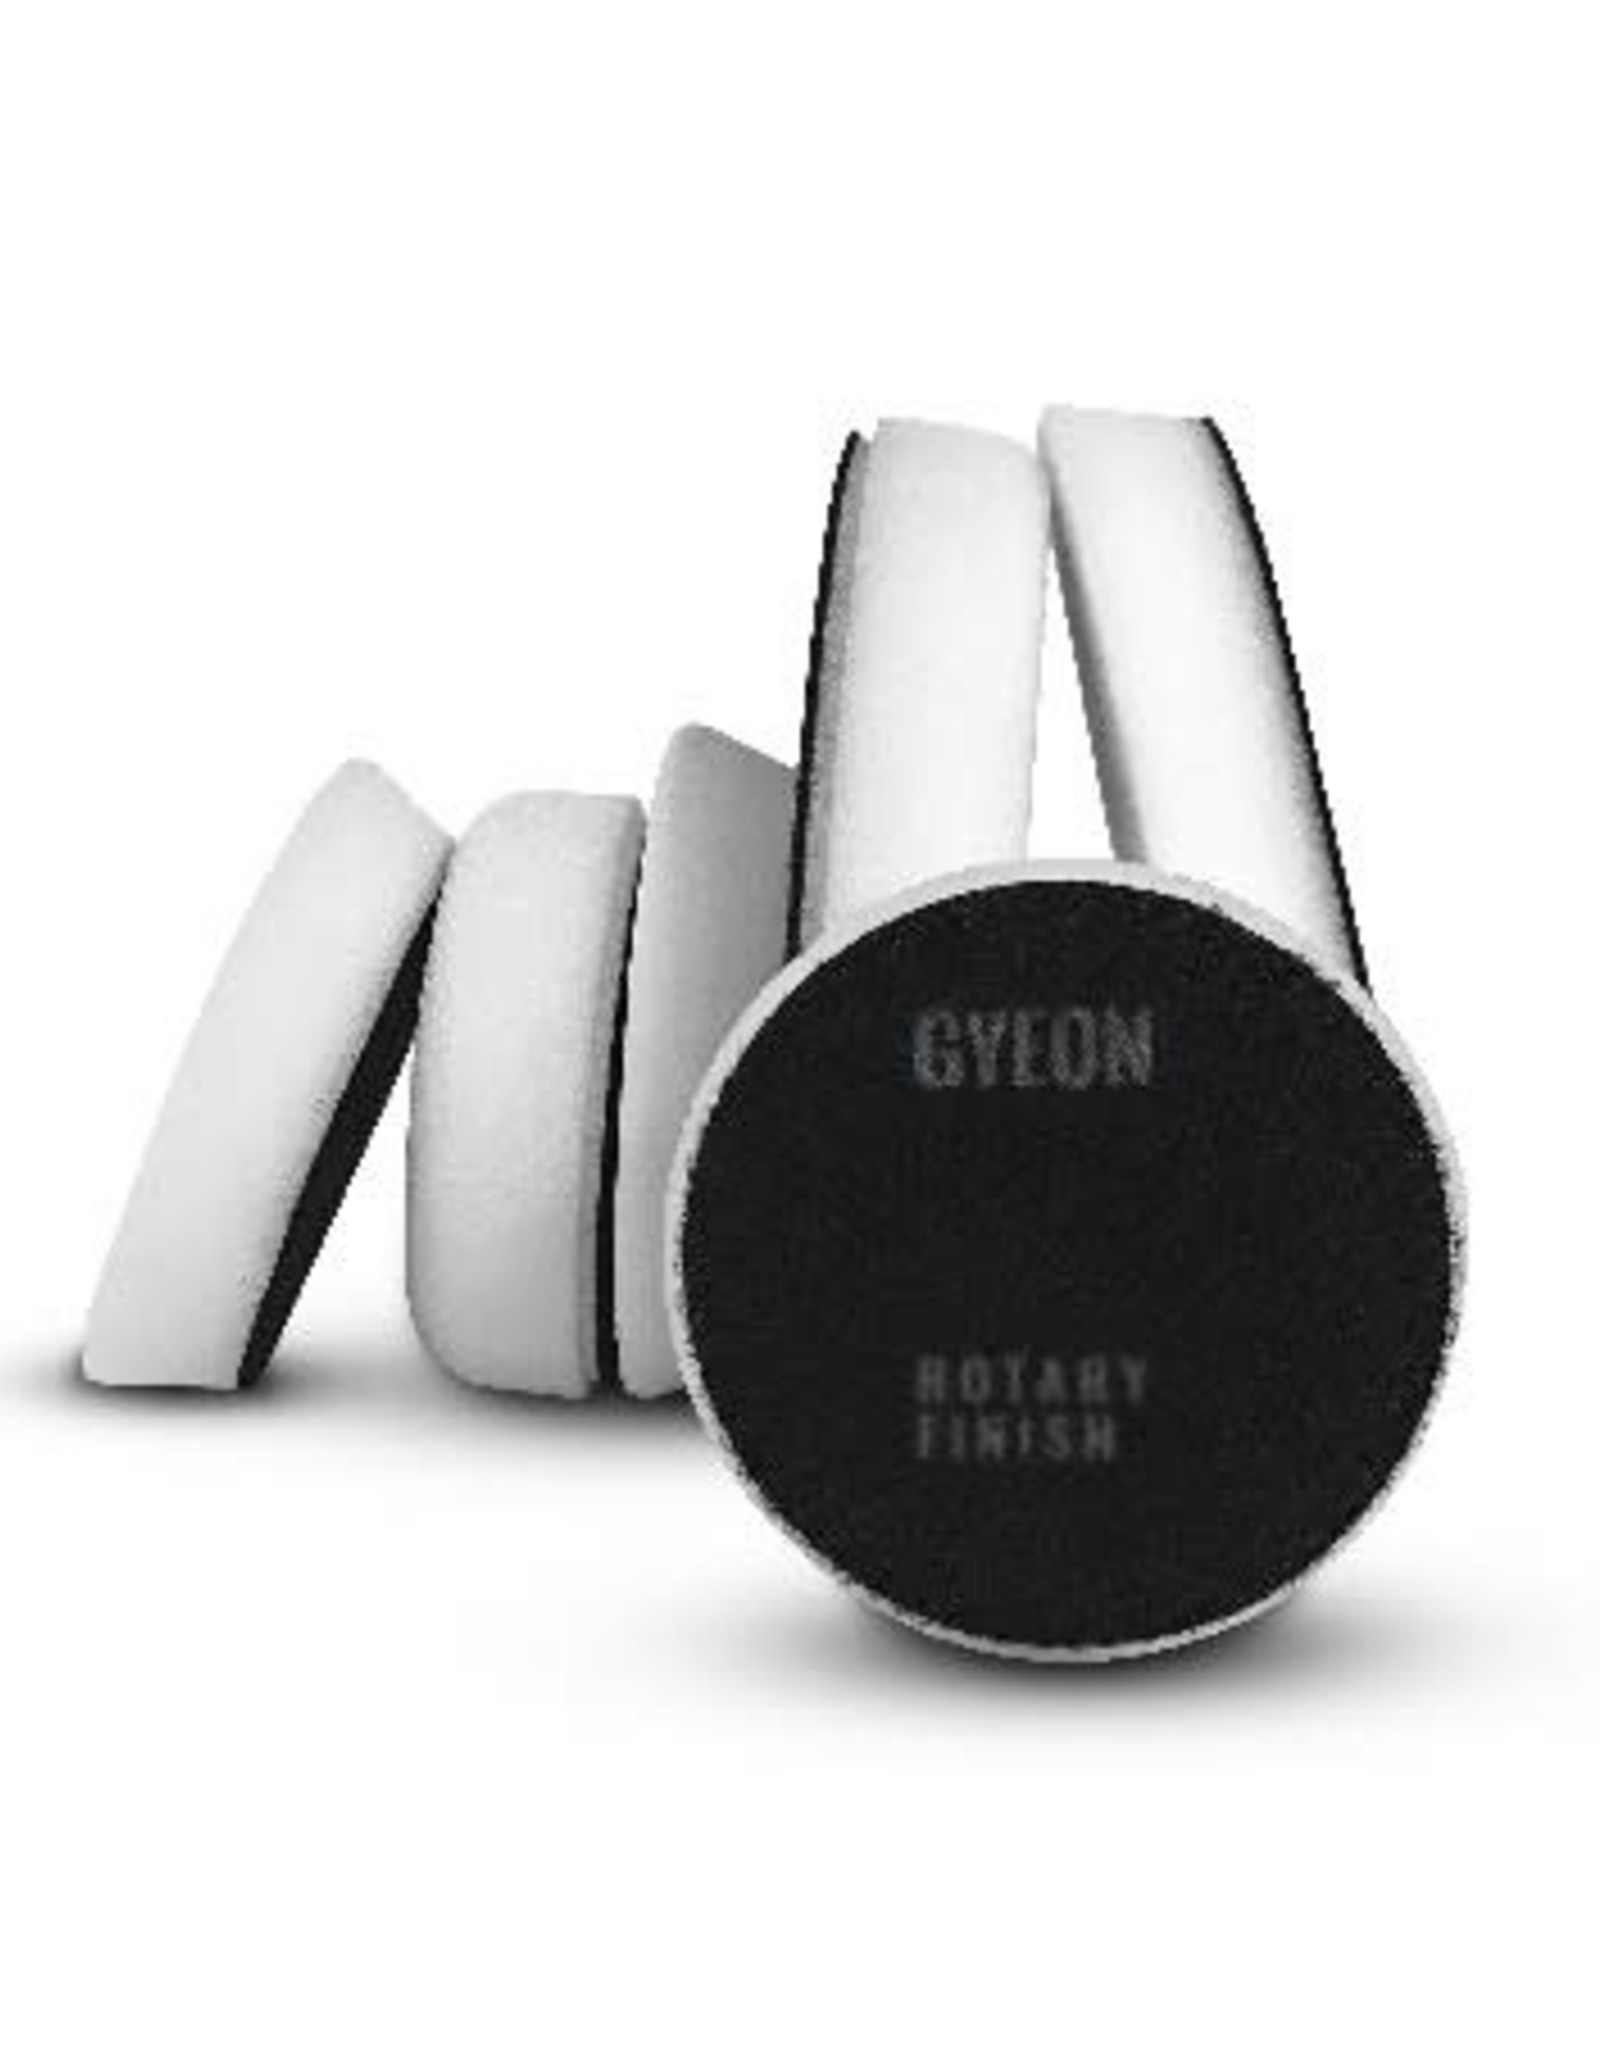 Gyeon Q²M Rotary Finish 145mm x 25mm